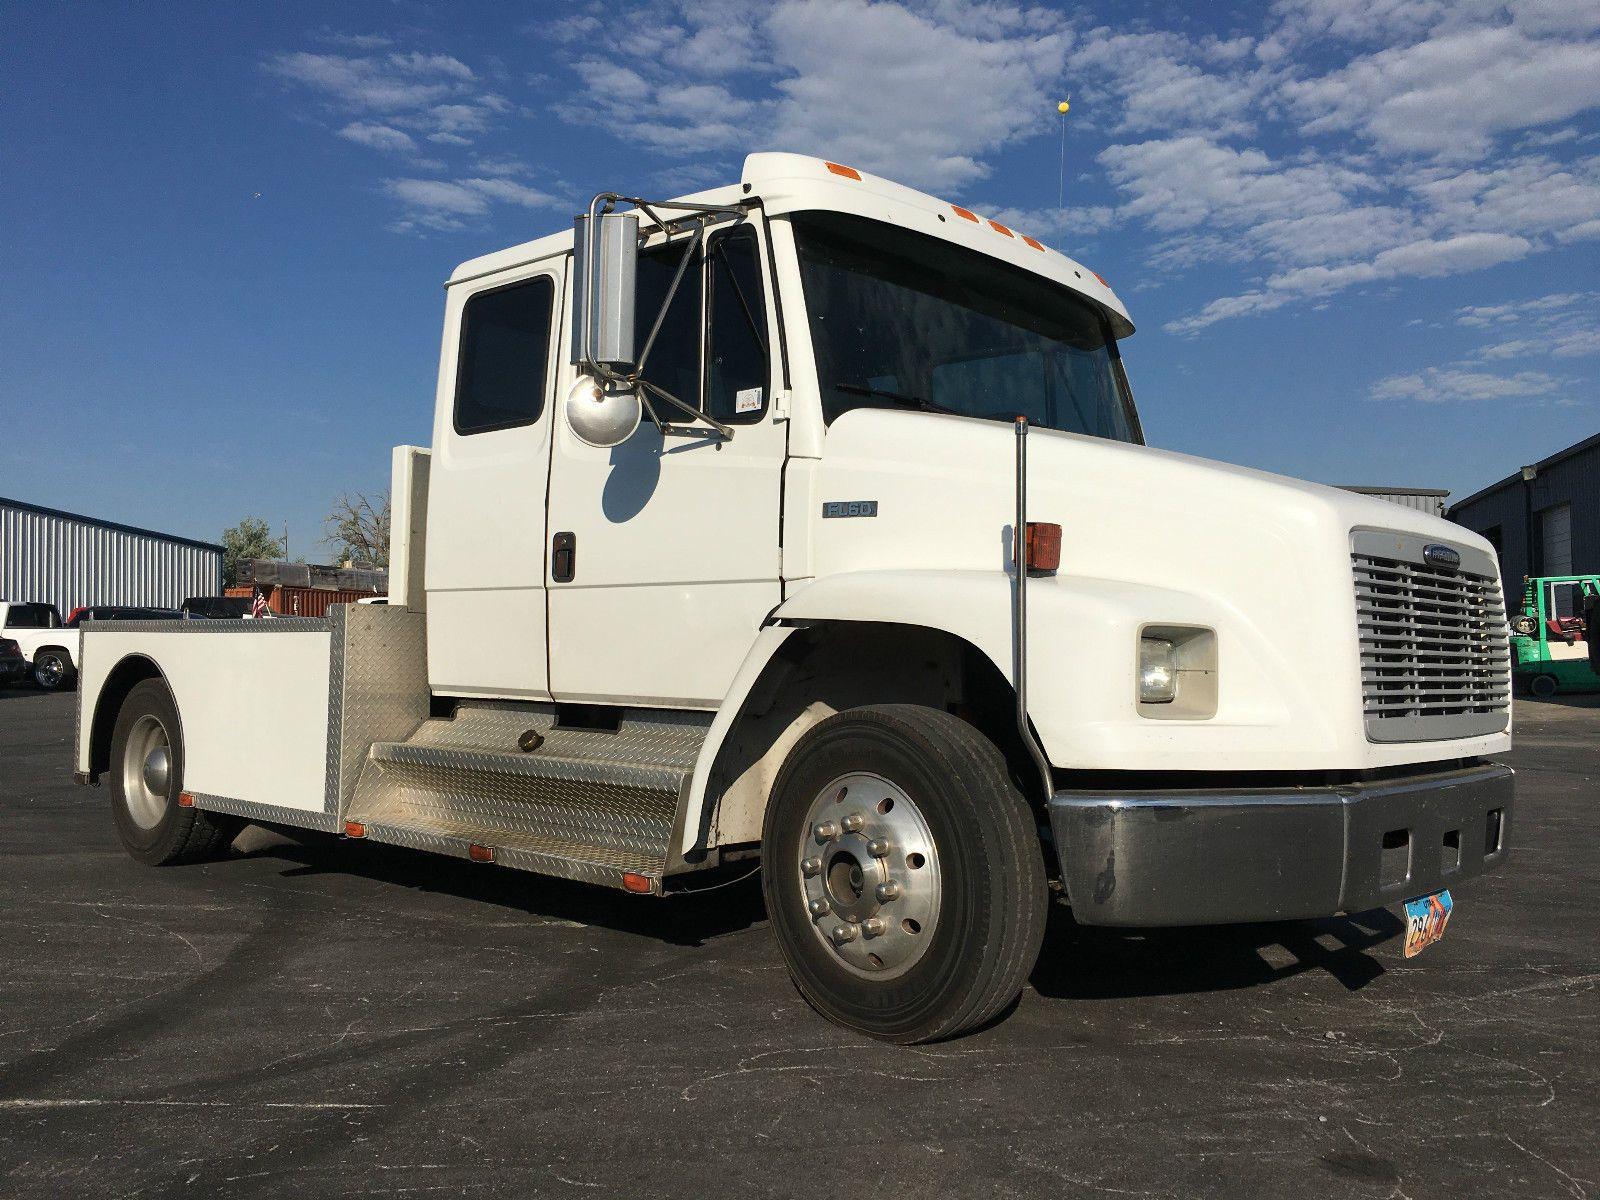 2002 Freightliner Fl60 Extended Cab Truck Freightliner Extended Cab Trucks